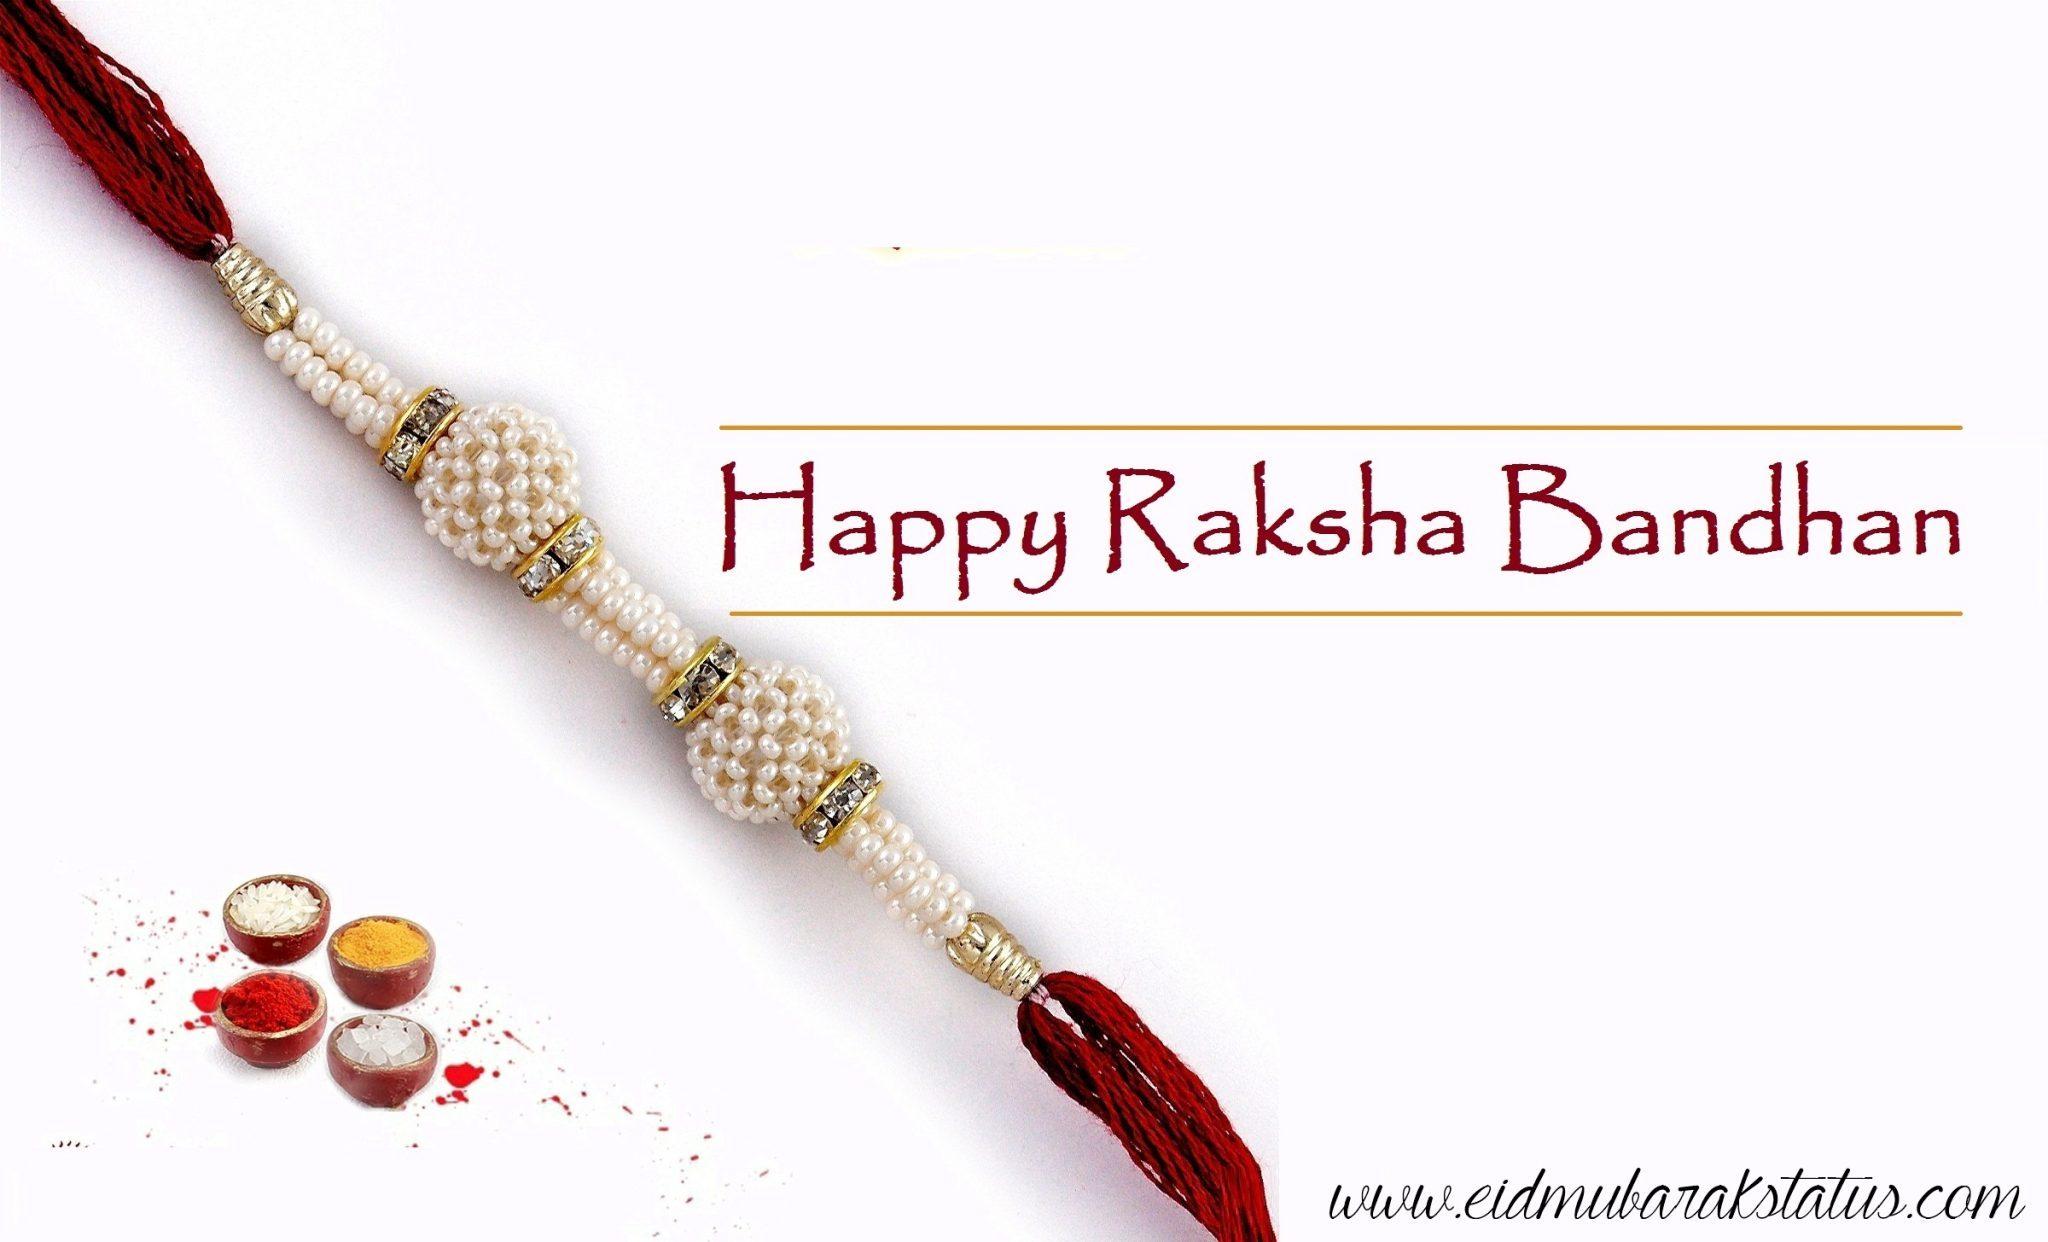 Happy Raksha Bandhan Cover Pictures for Facebook & Google Plus